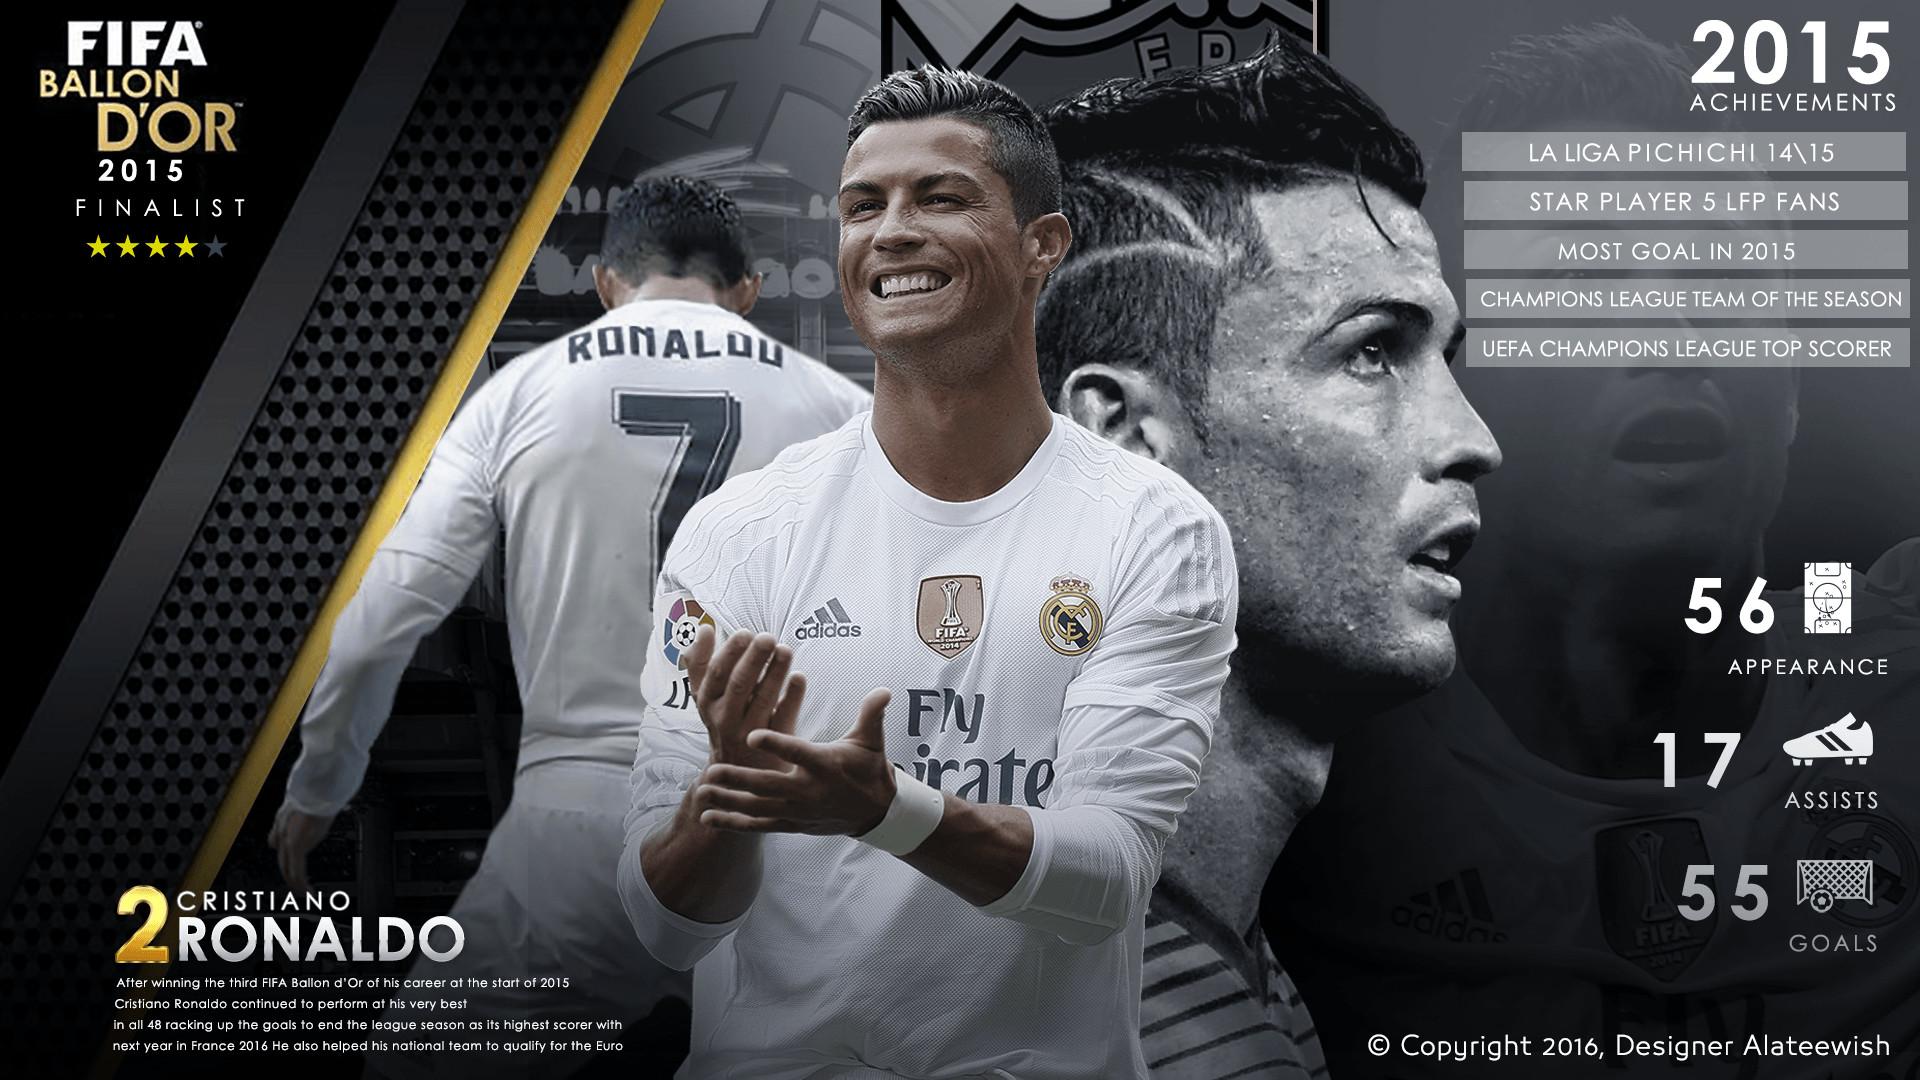 Cristiano Ronaldo Wallpapers Nike Mercurial 2016 – Wallpaper Cave